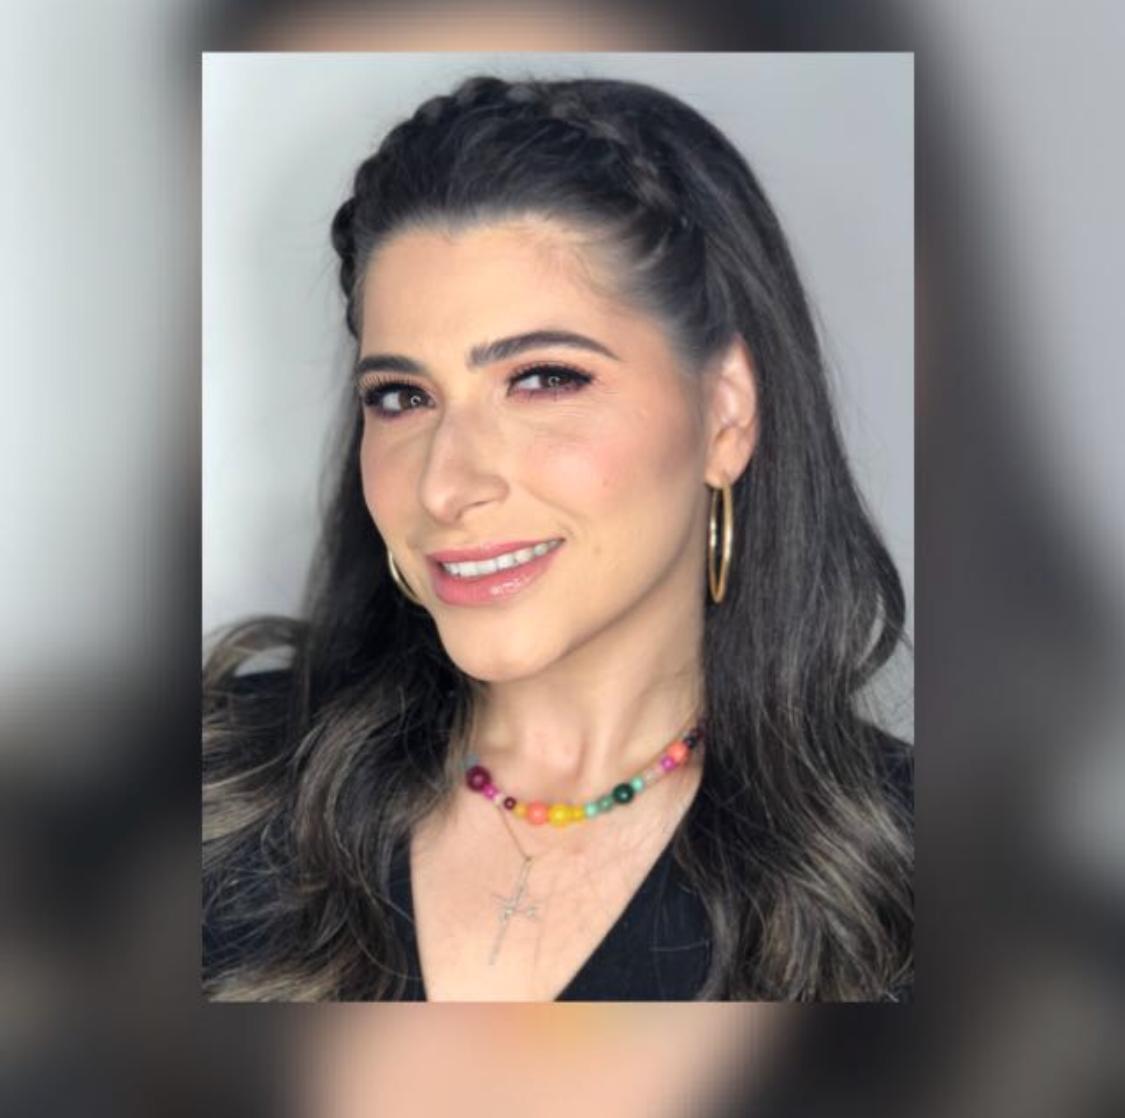 Lorena Cerqueira - Procuro-me